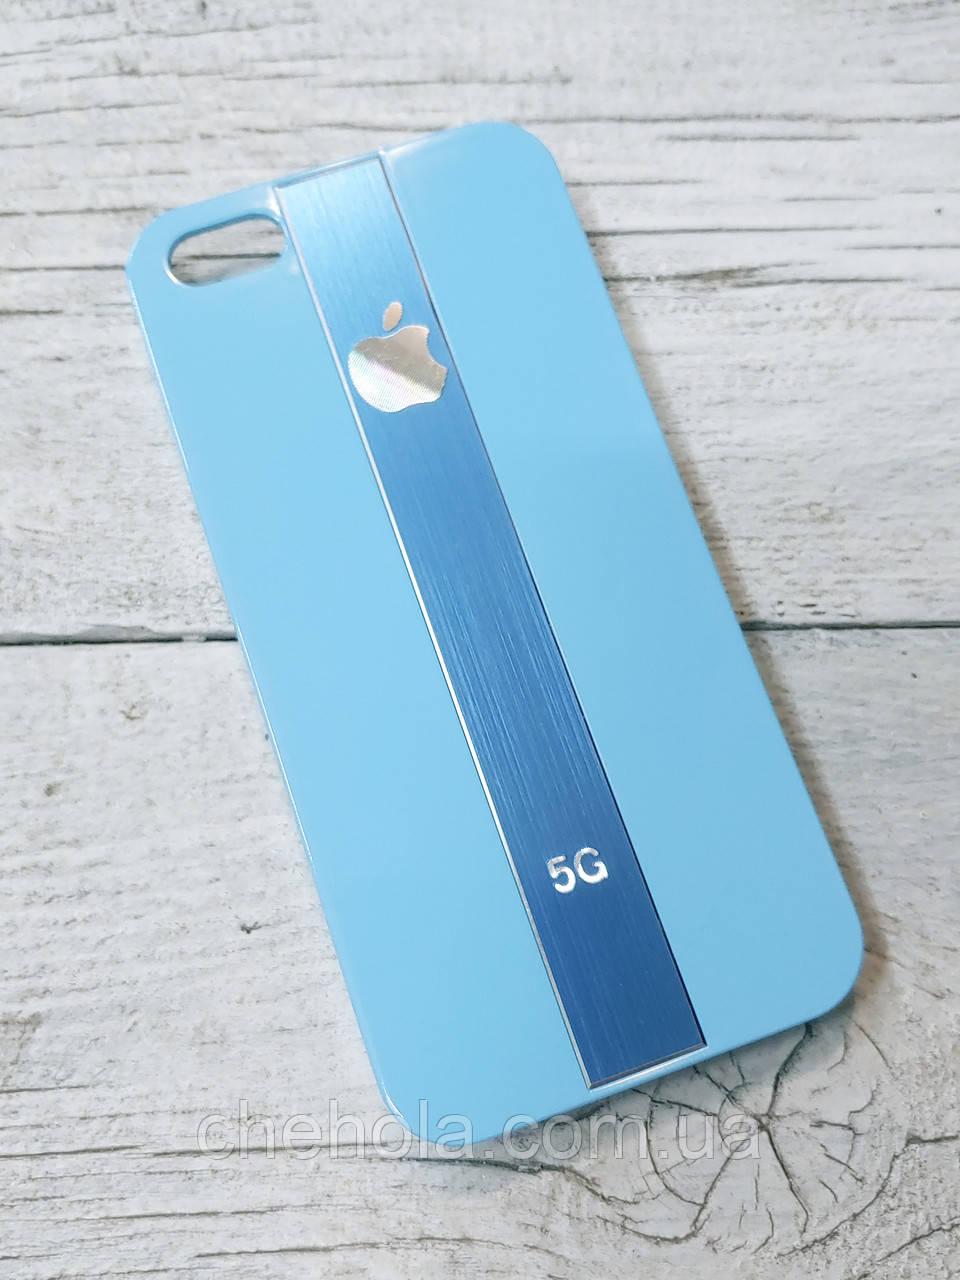 Протиударний Чохол для Iphone 5 5S SE Juicy Metal Блакитний